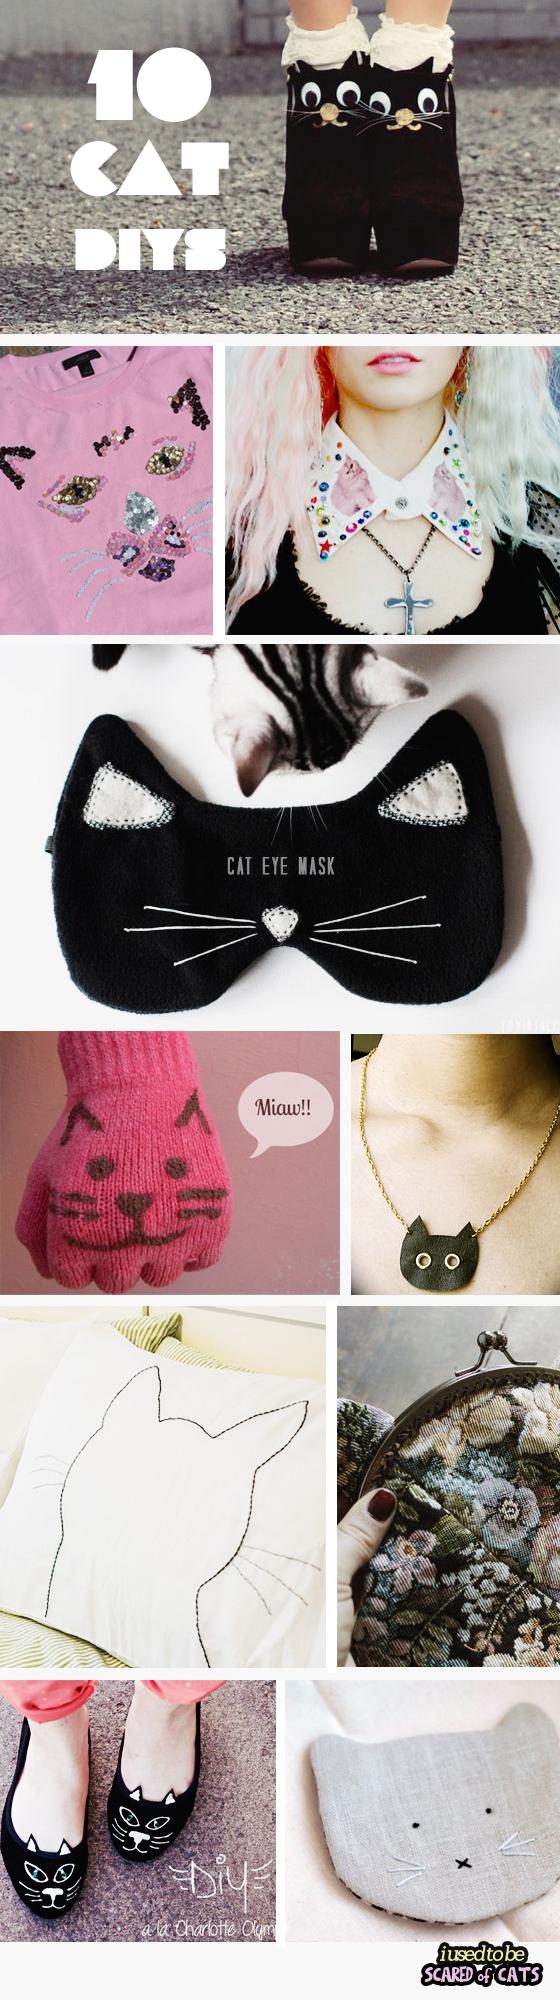 top 10 cat diys